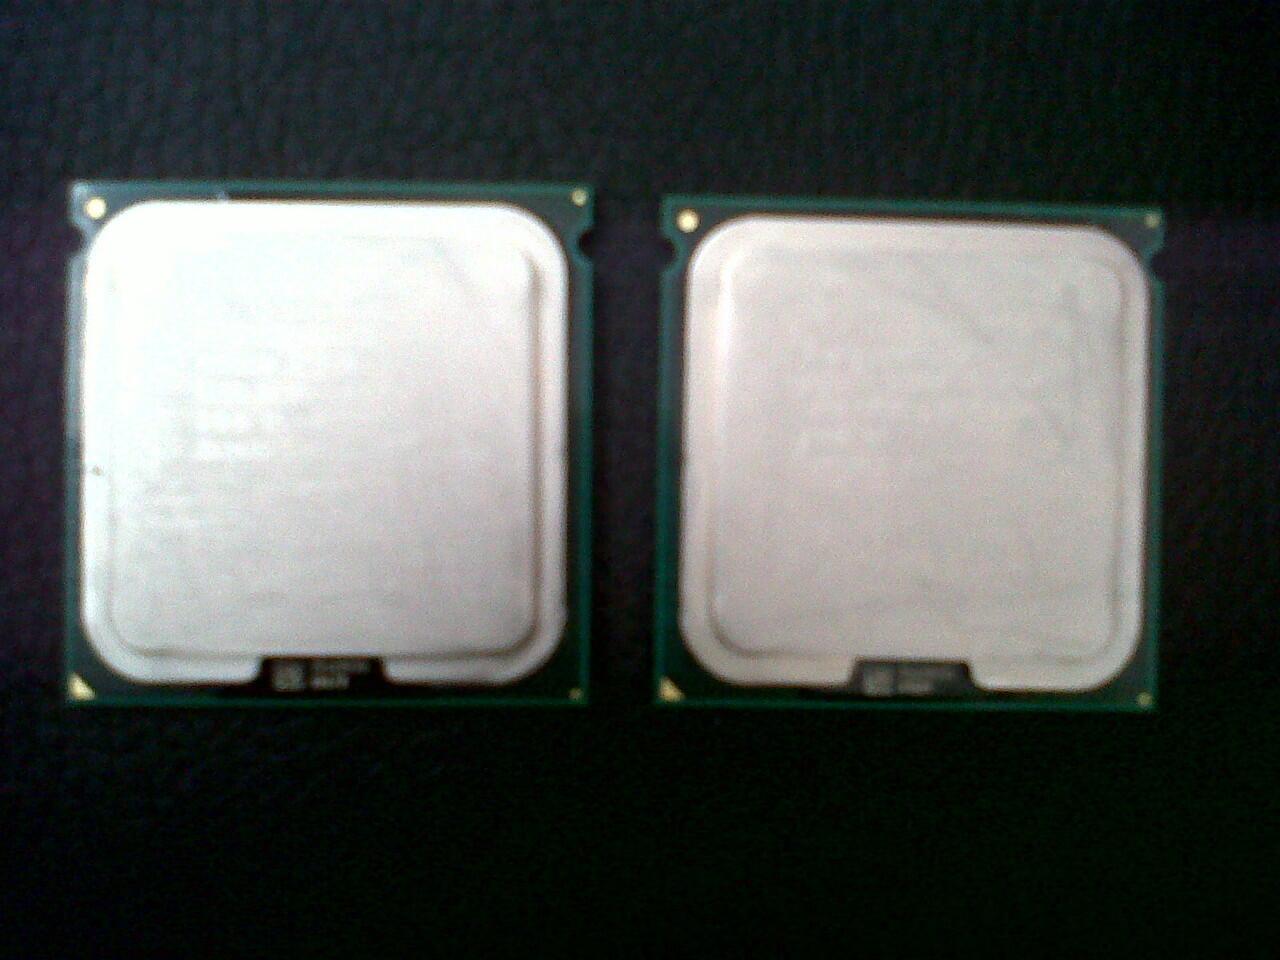 XEON - 5150